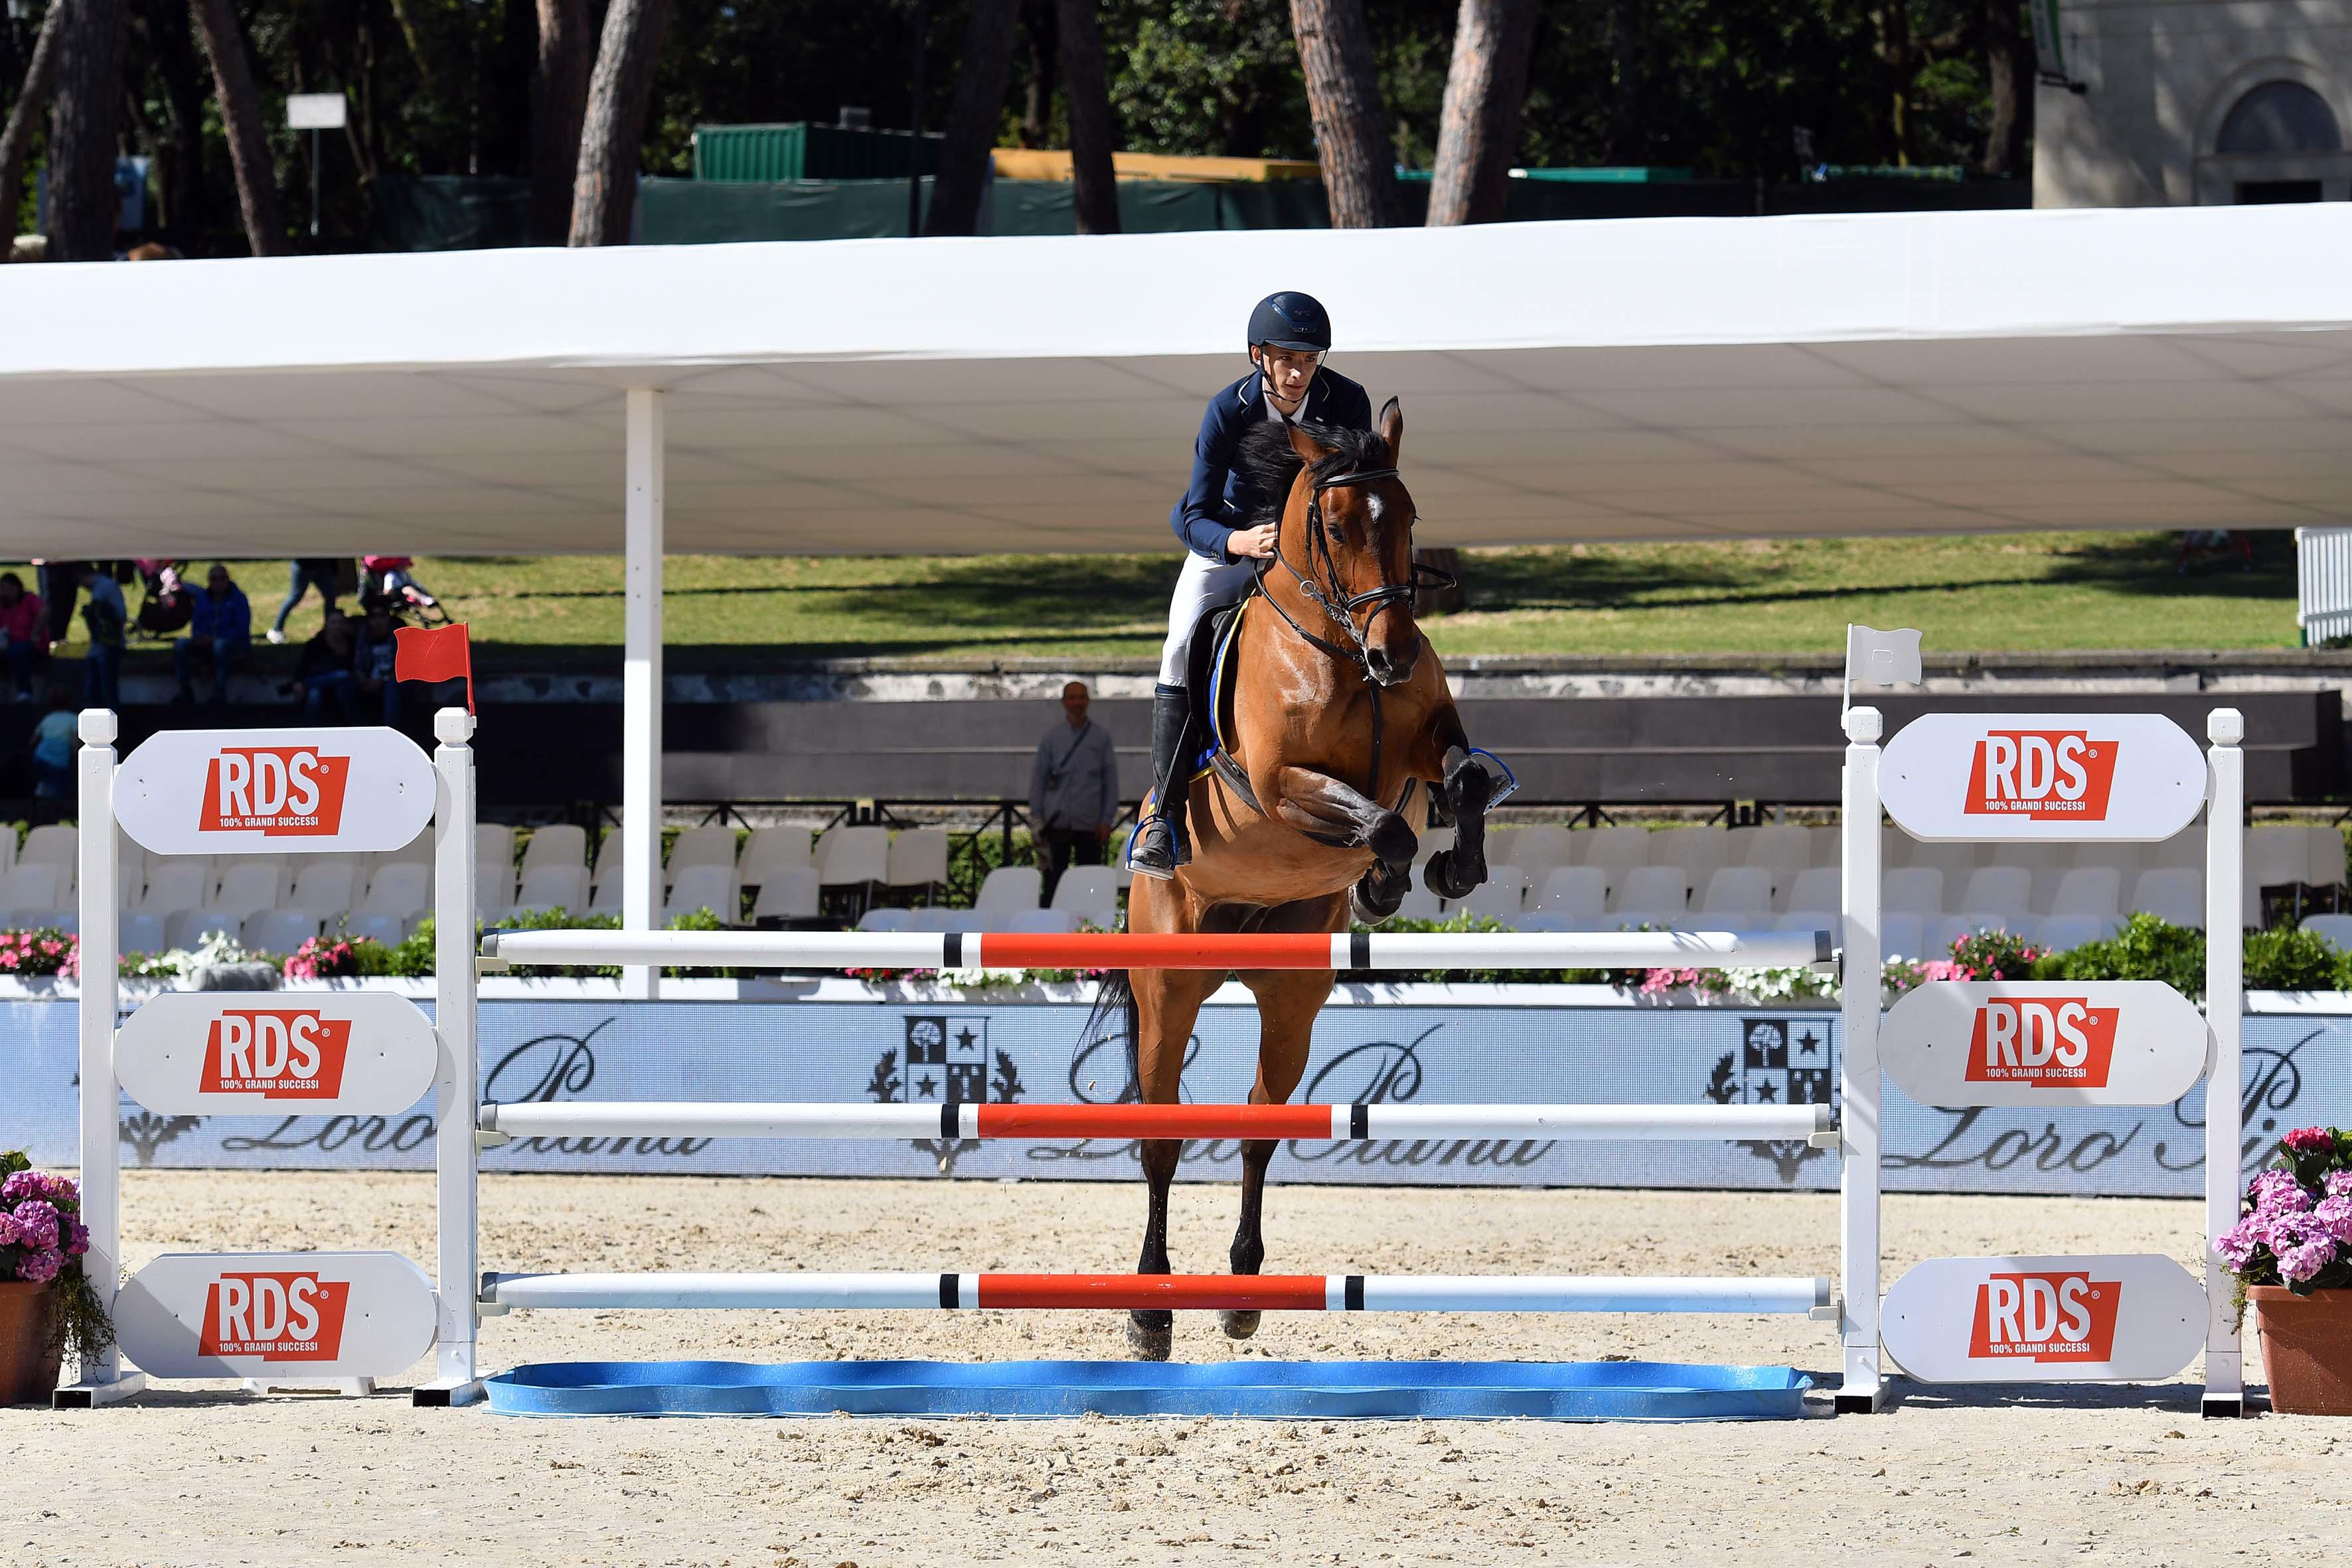 b170526002 PiazzaDiSiena Foto Simone Ferraro - CONI